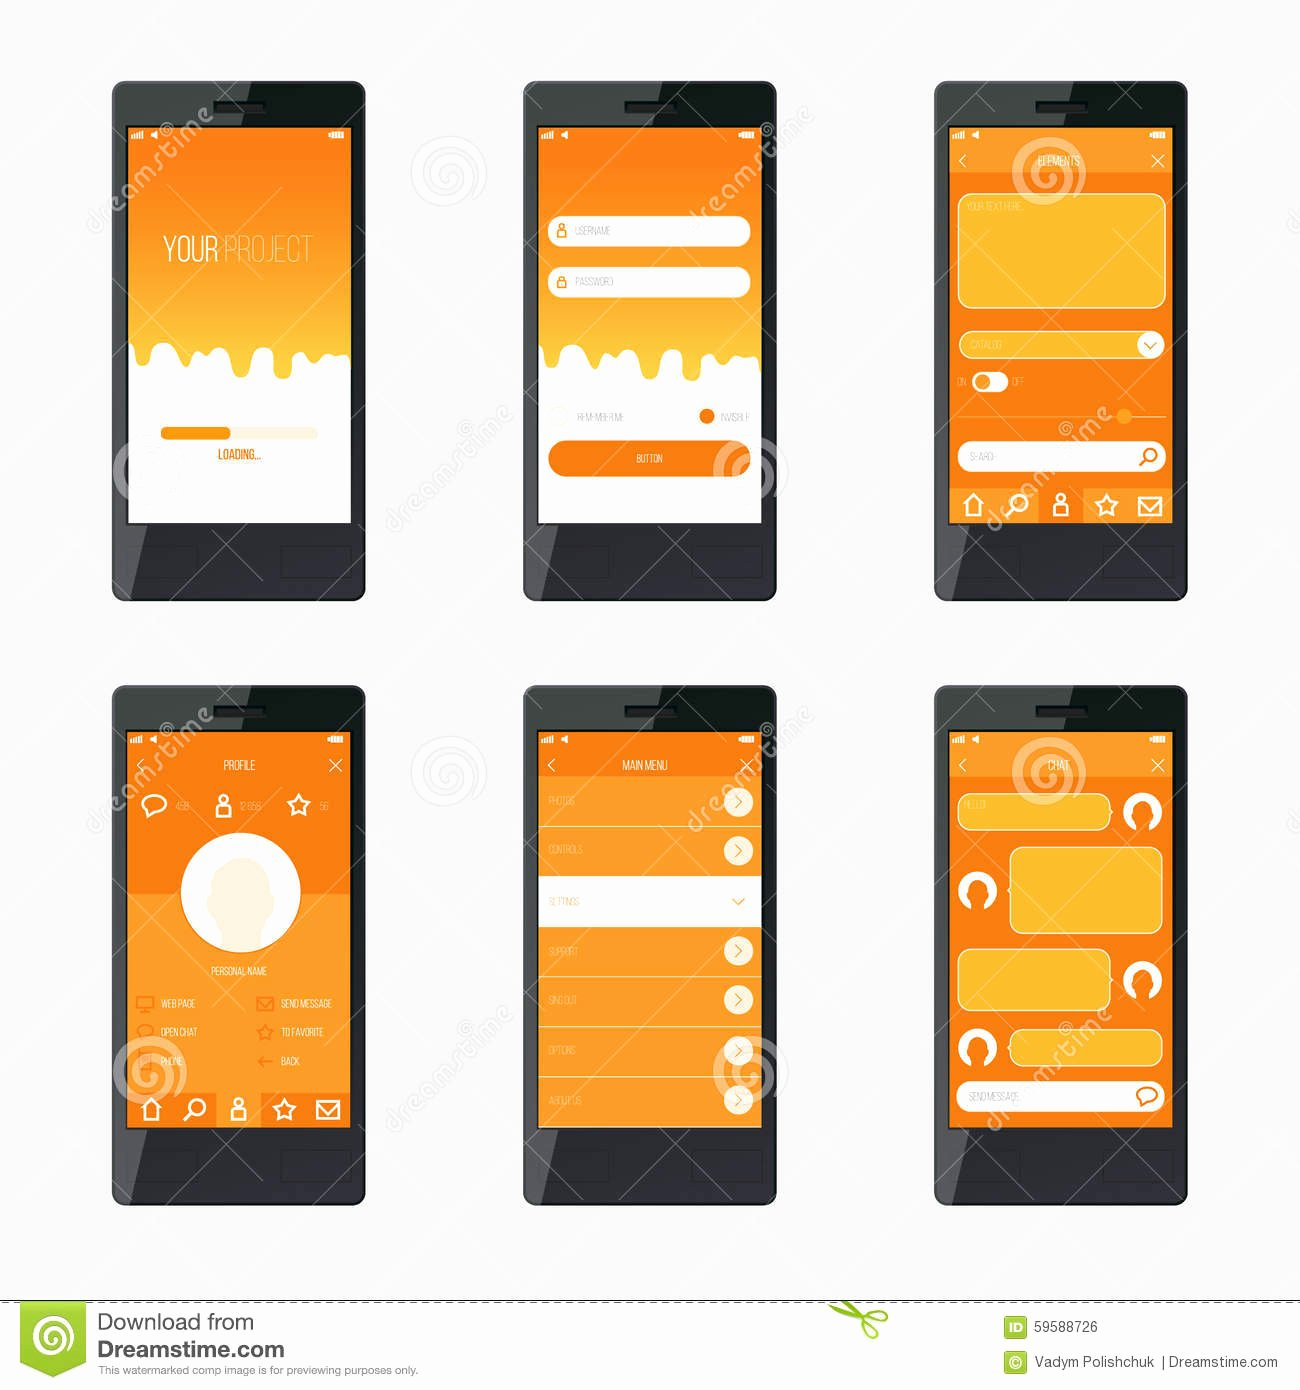 Mobile Apps Design Template Inspirational Template Mobile Application Interface Design Stock Vector